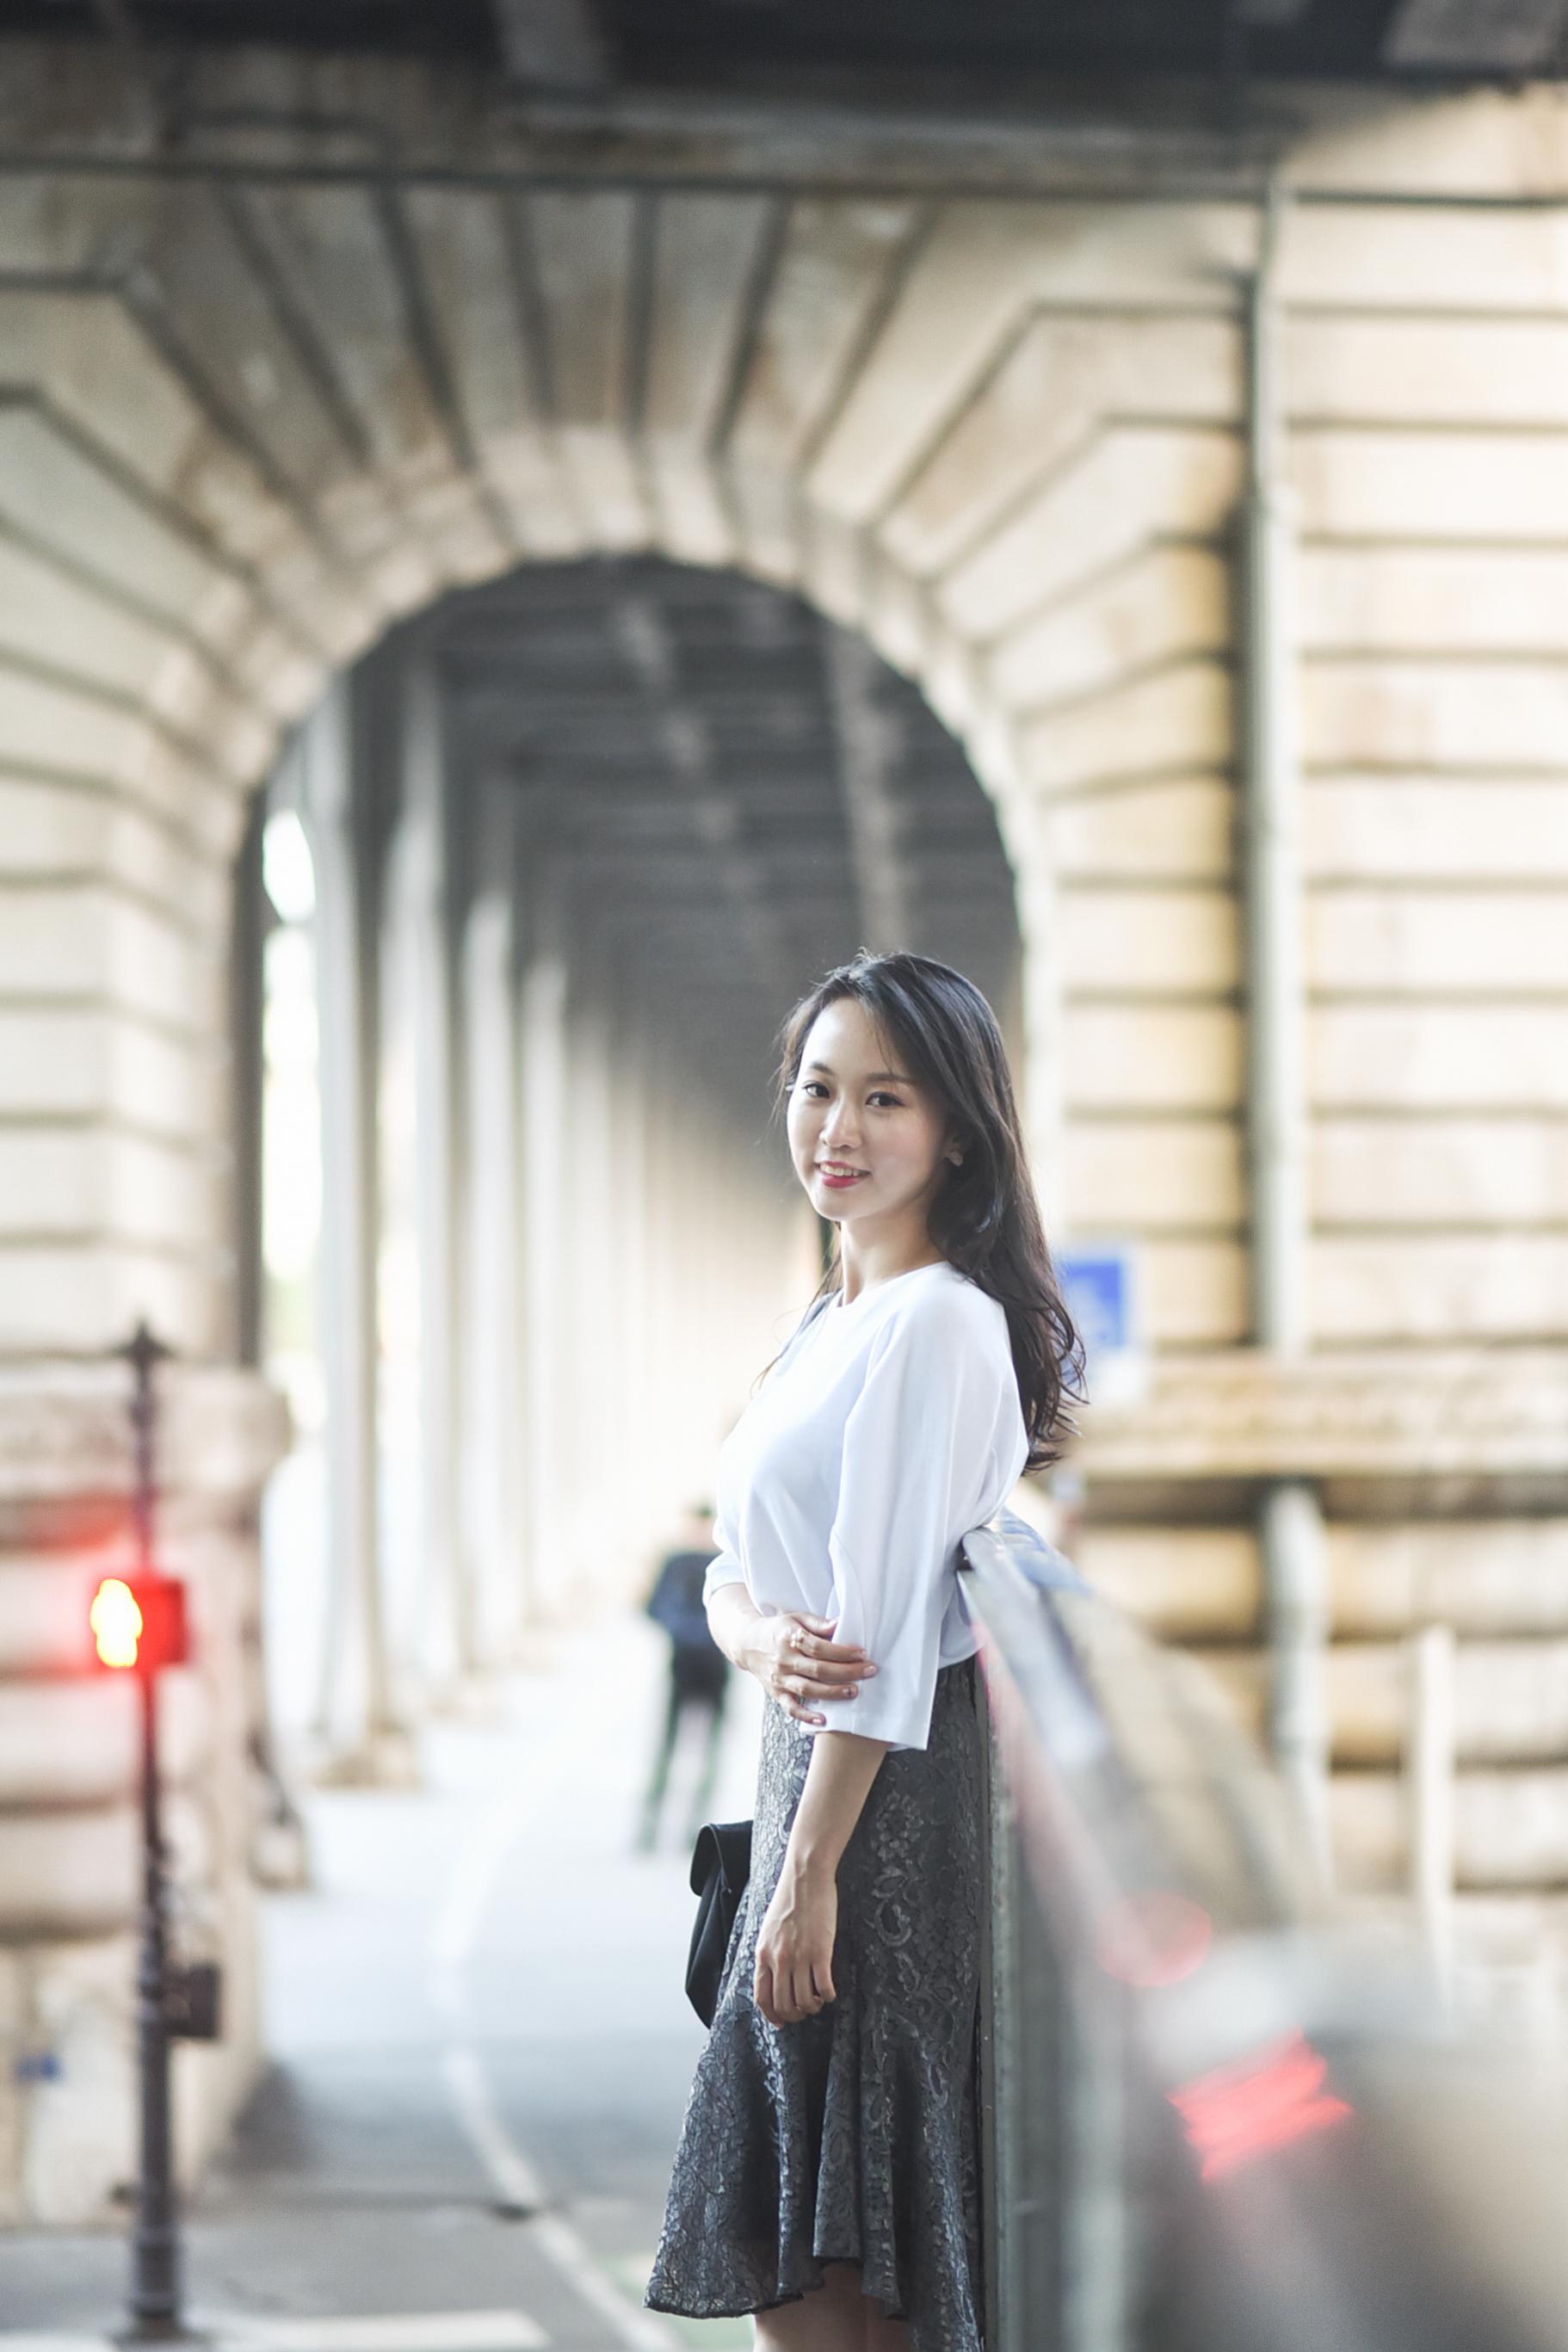 Sprazzi_Professional_Portrait_Photo_Paris_Kyunga_Original_16.jpg